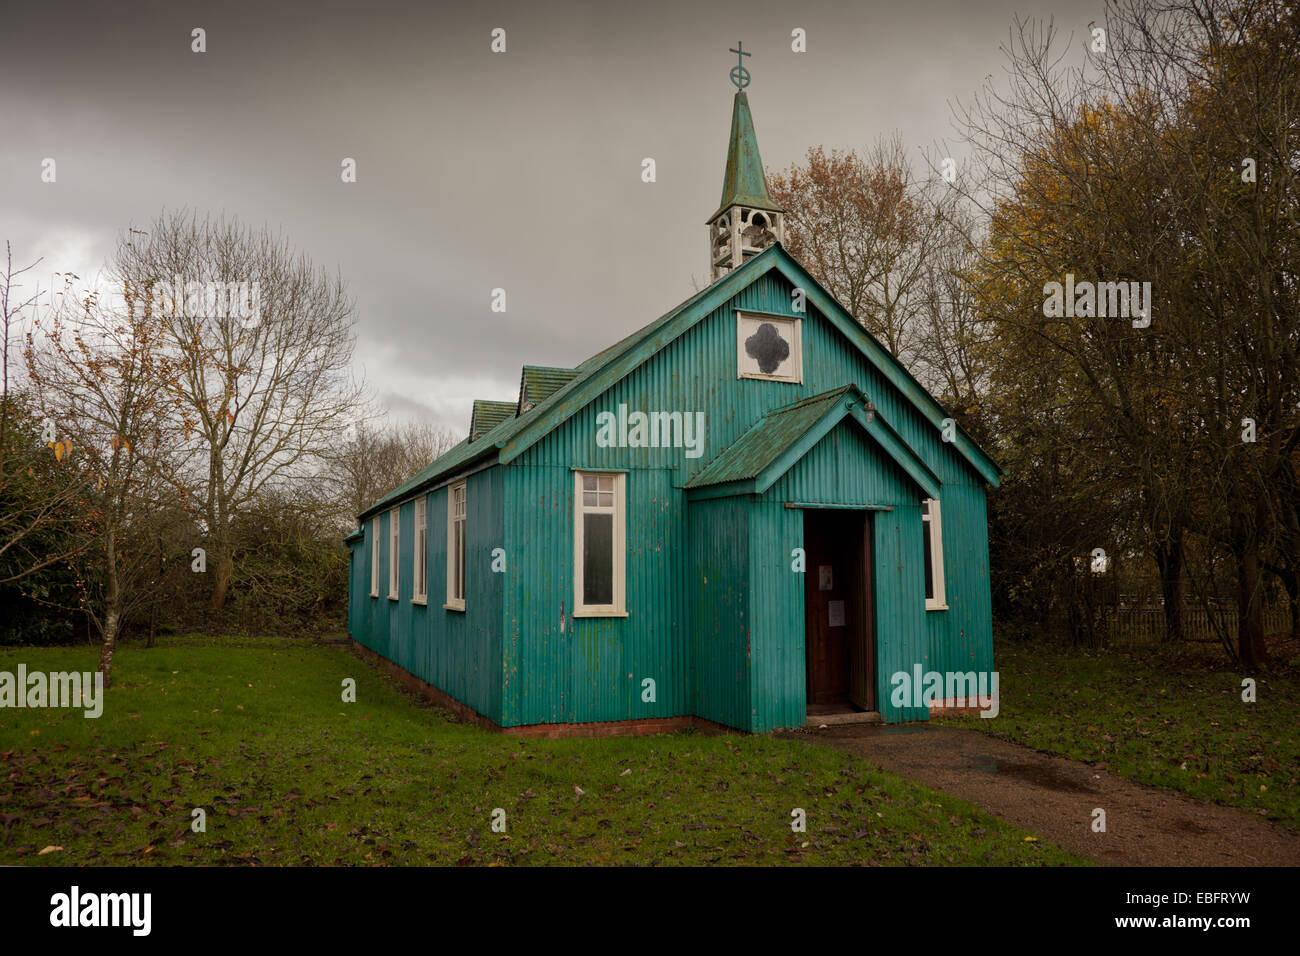 The Victorian Mission Church, Avoncroft, Bromsgrove, Worcs UK - Stock Image